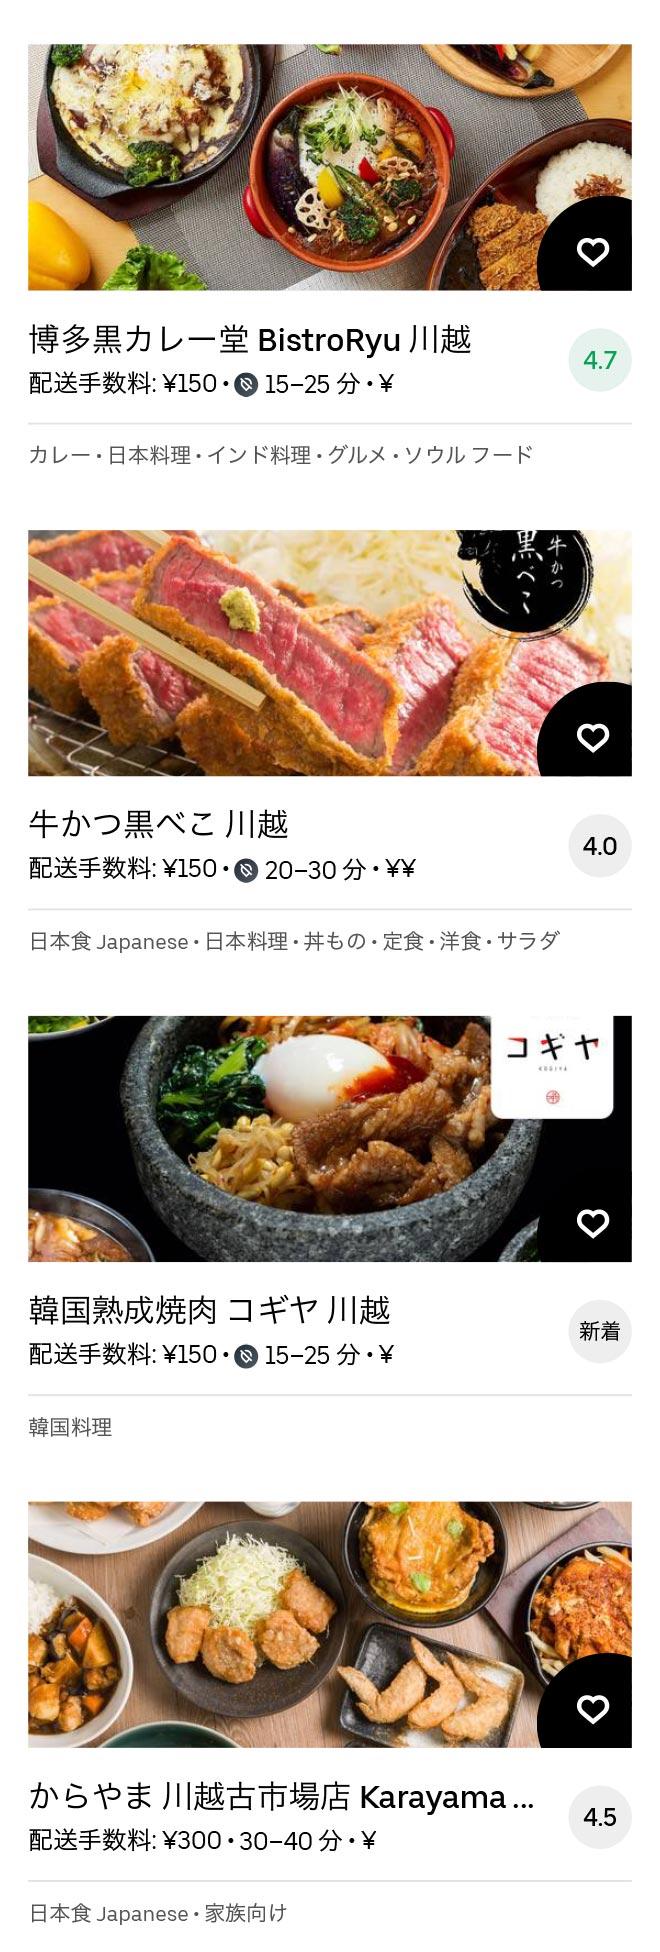 Kamifukuoka menu 2011 07